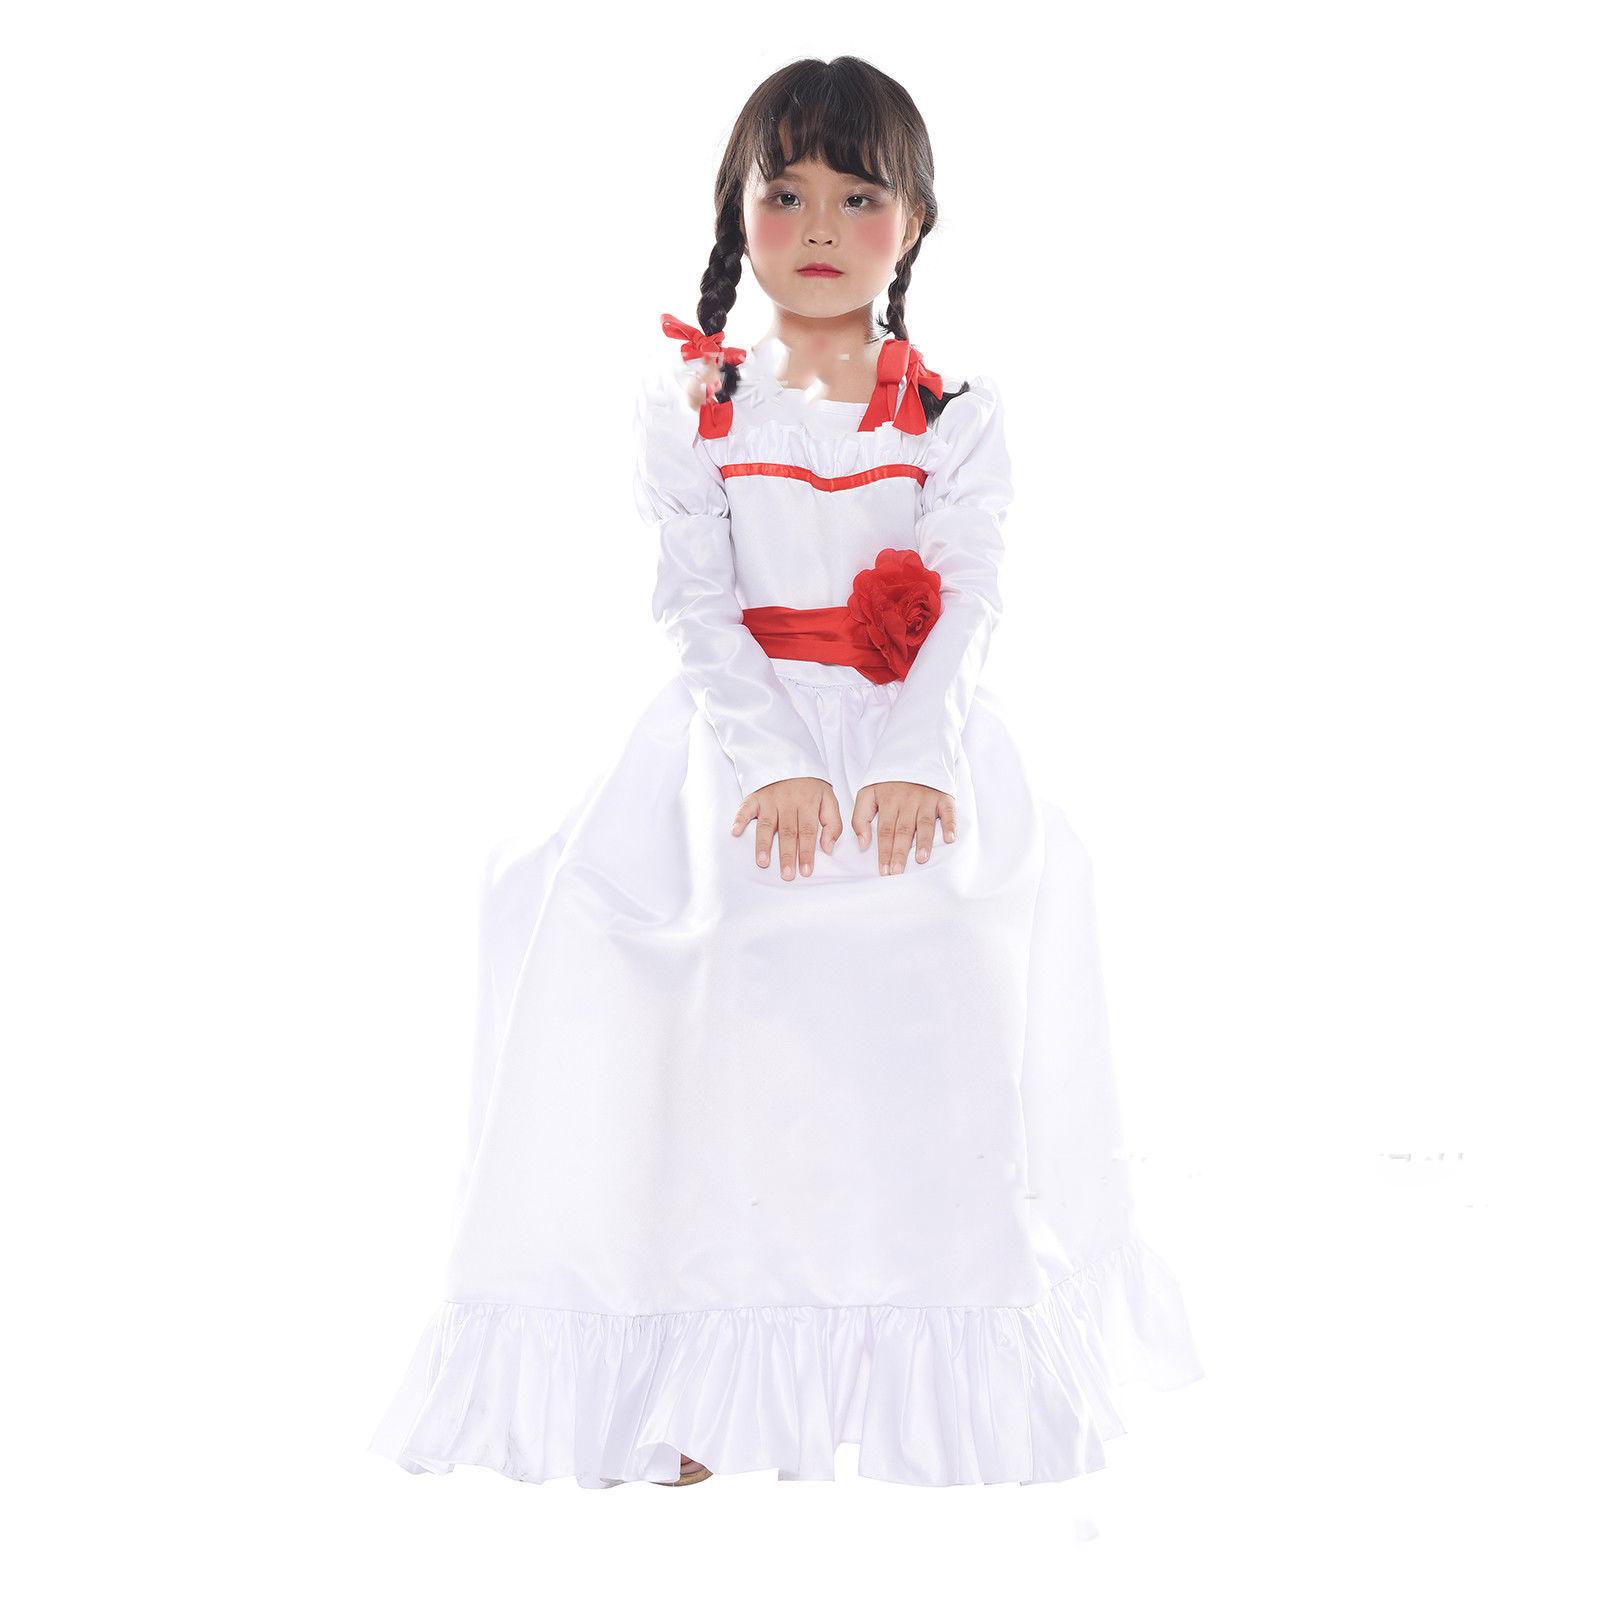 BROKEN DOLL GIRLS COSTUME Halloween Cosplay Fancy Dress G10